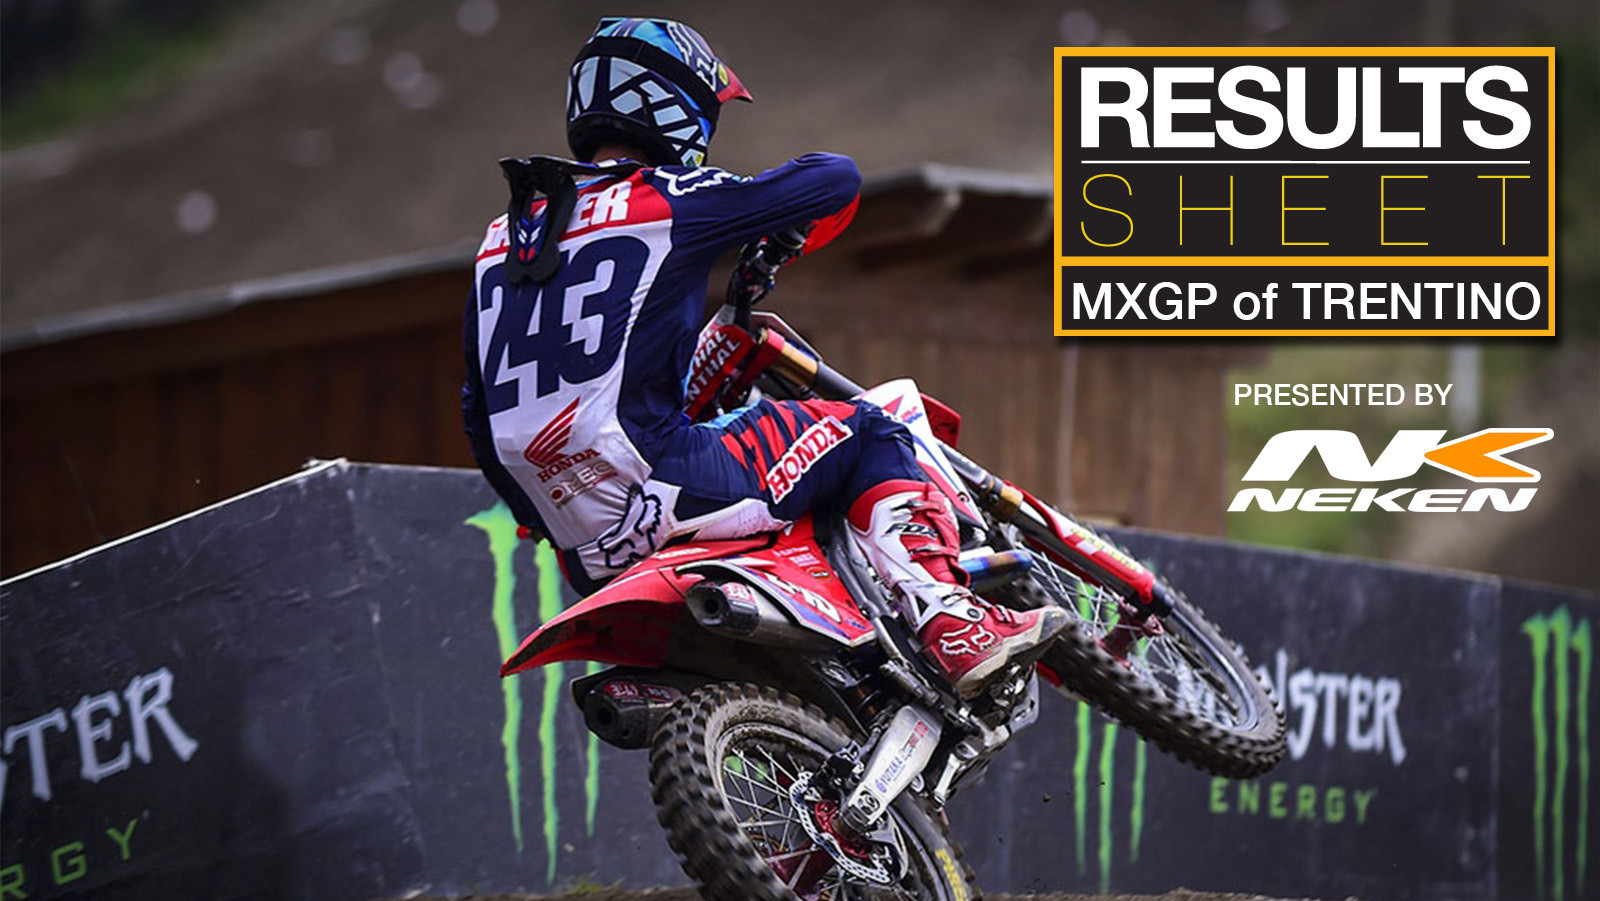 Results Sheet: 2017 MXGP of Trentino